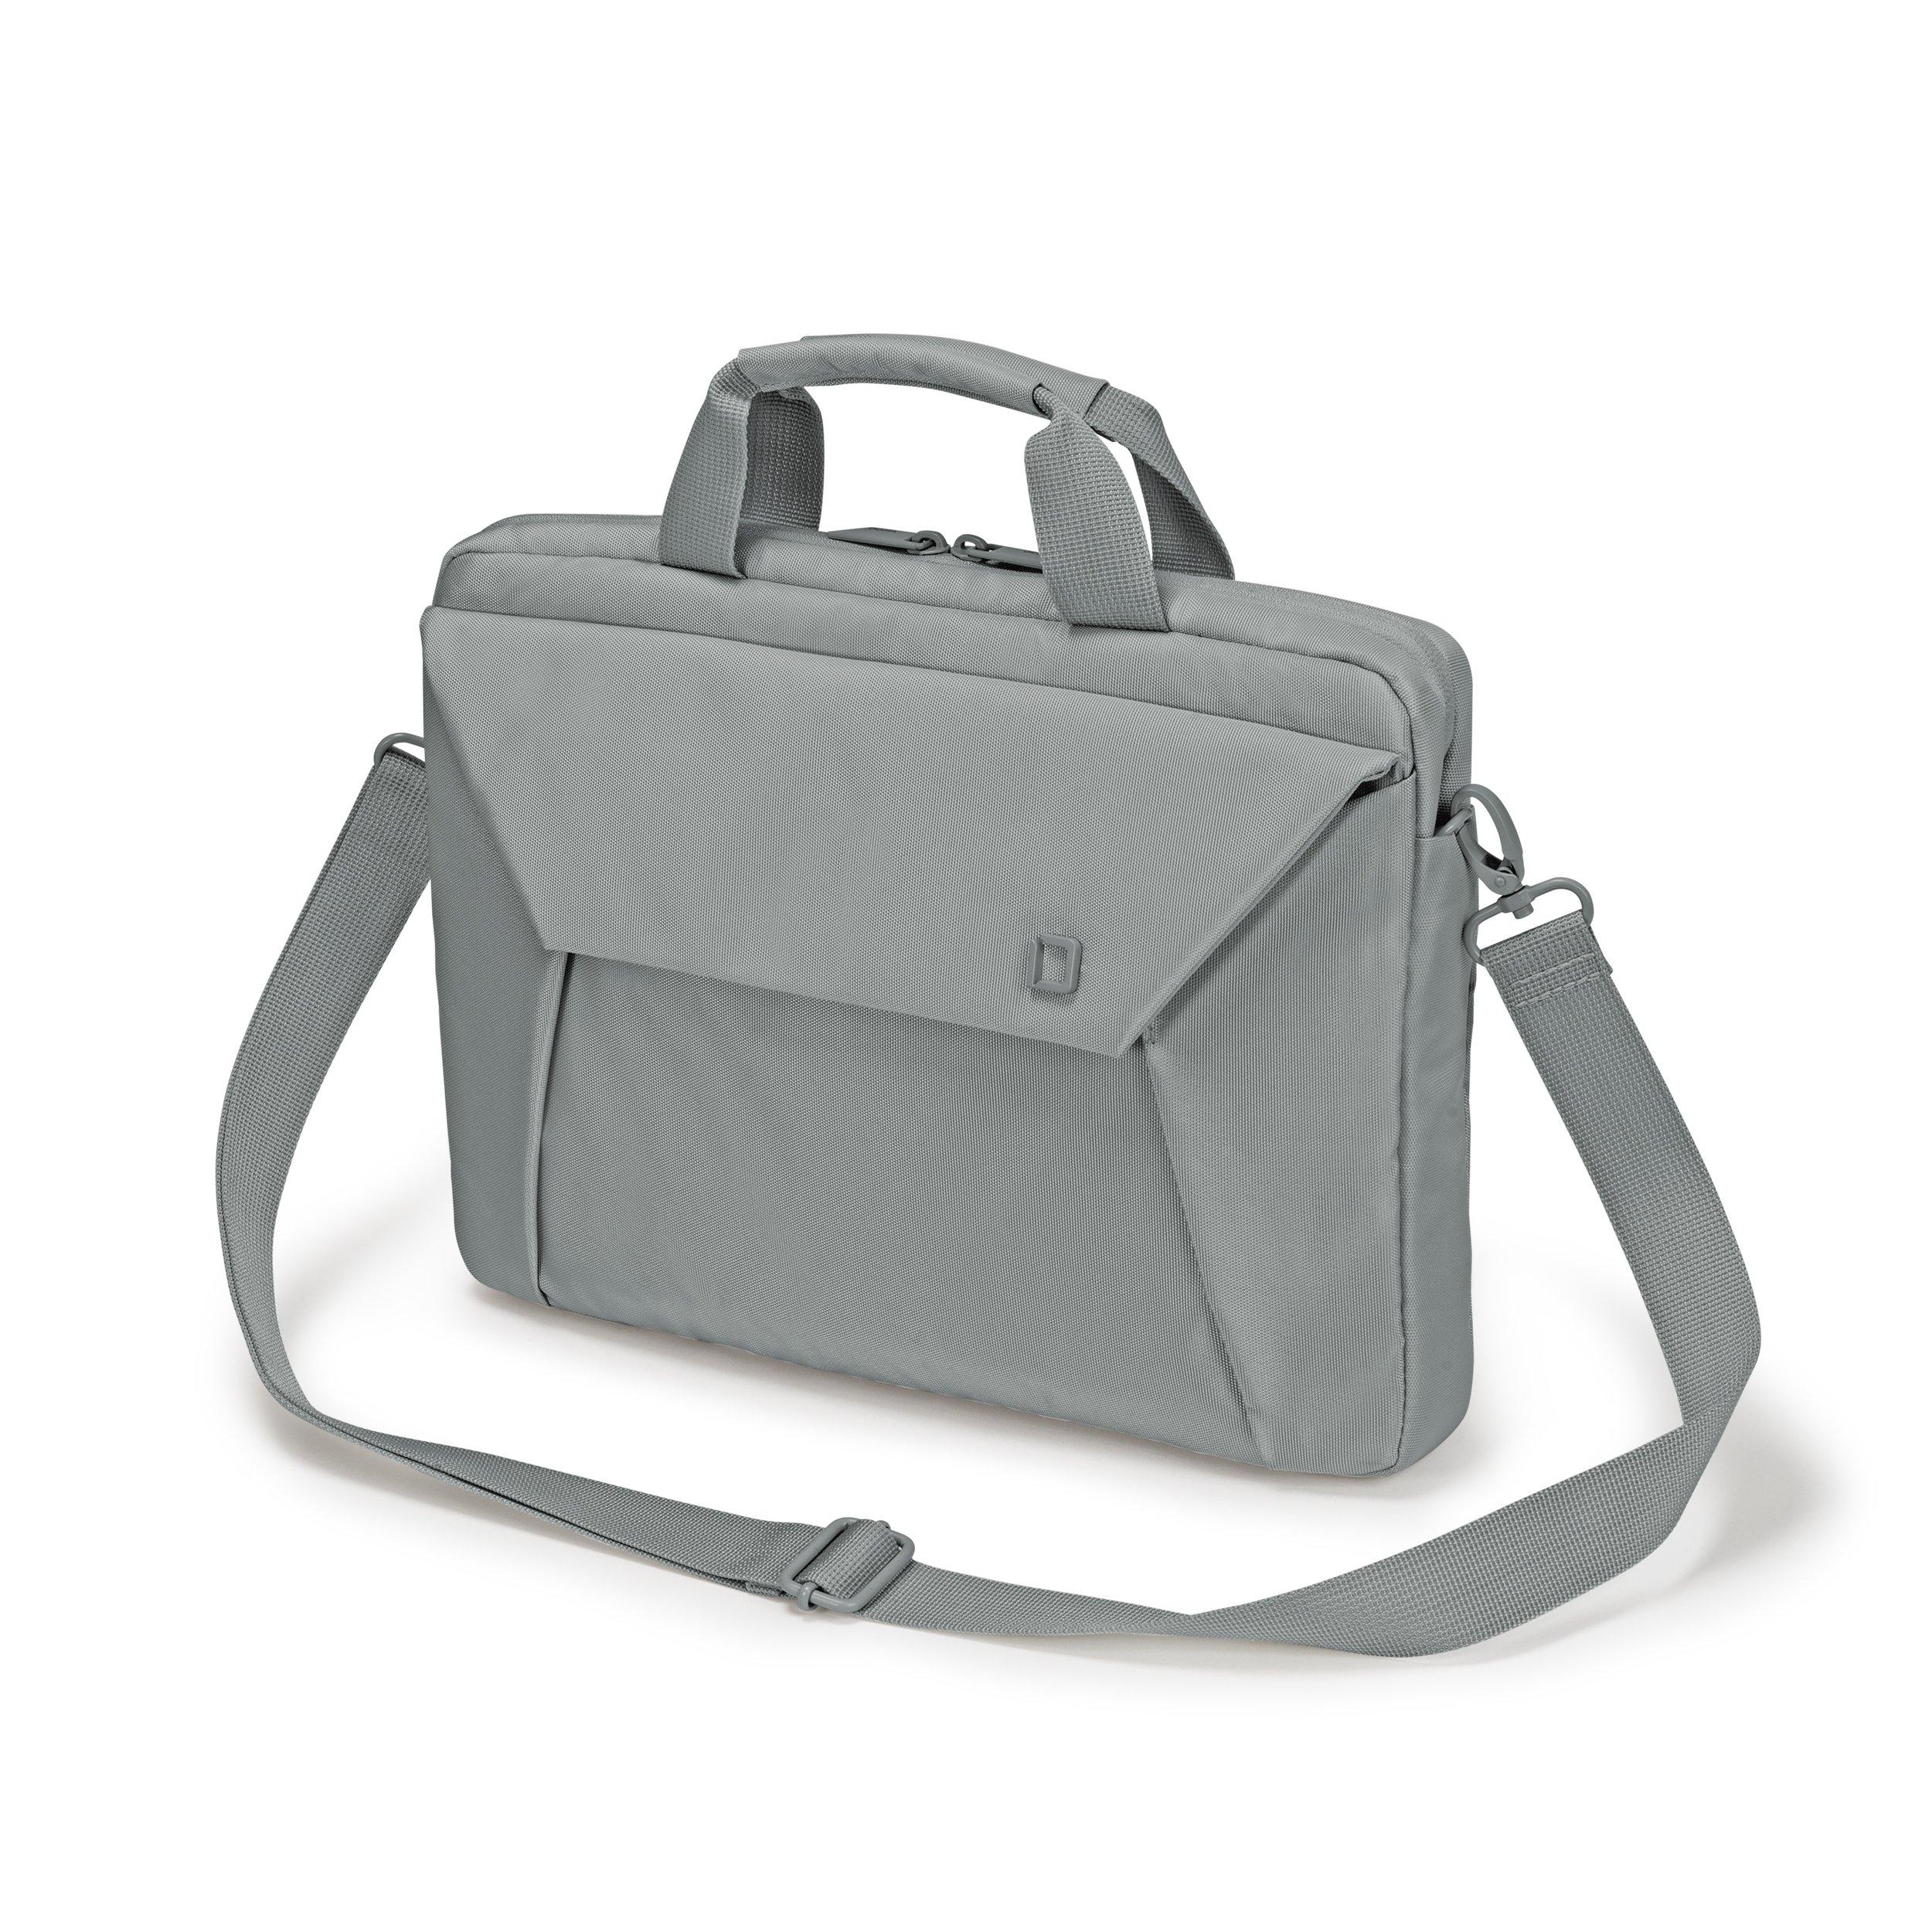 Dicota D31211 13.3 Briefcase Grey notebook case - notebook cases (33.8 cm (13.3), Briefcase, Gr